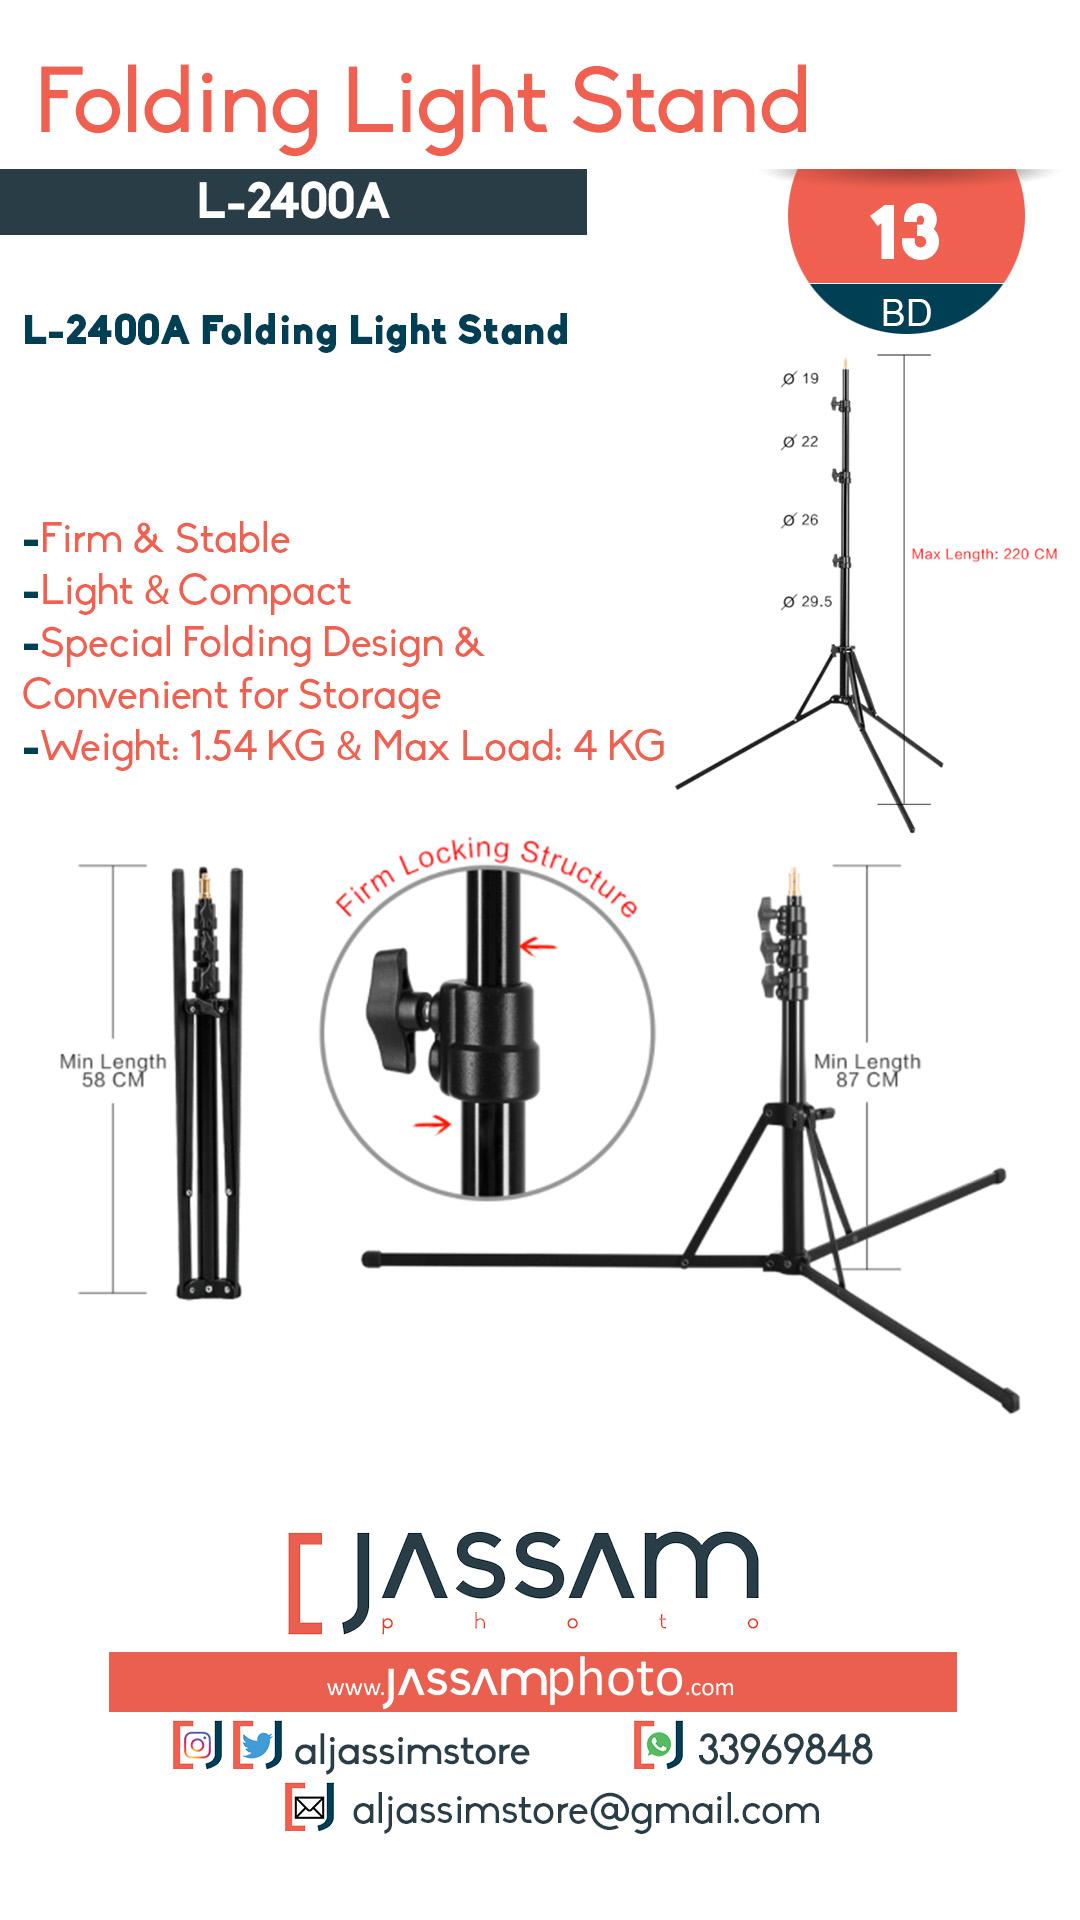 Folding Stand L-2400A